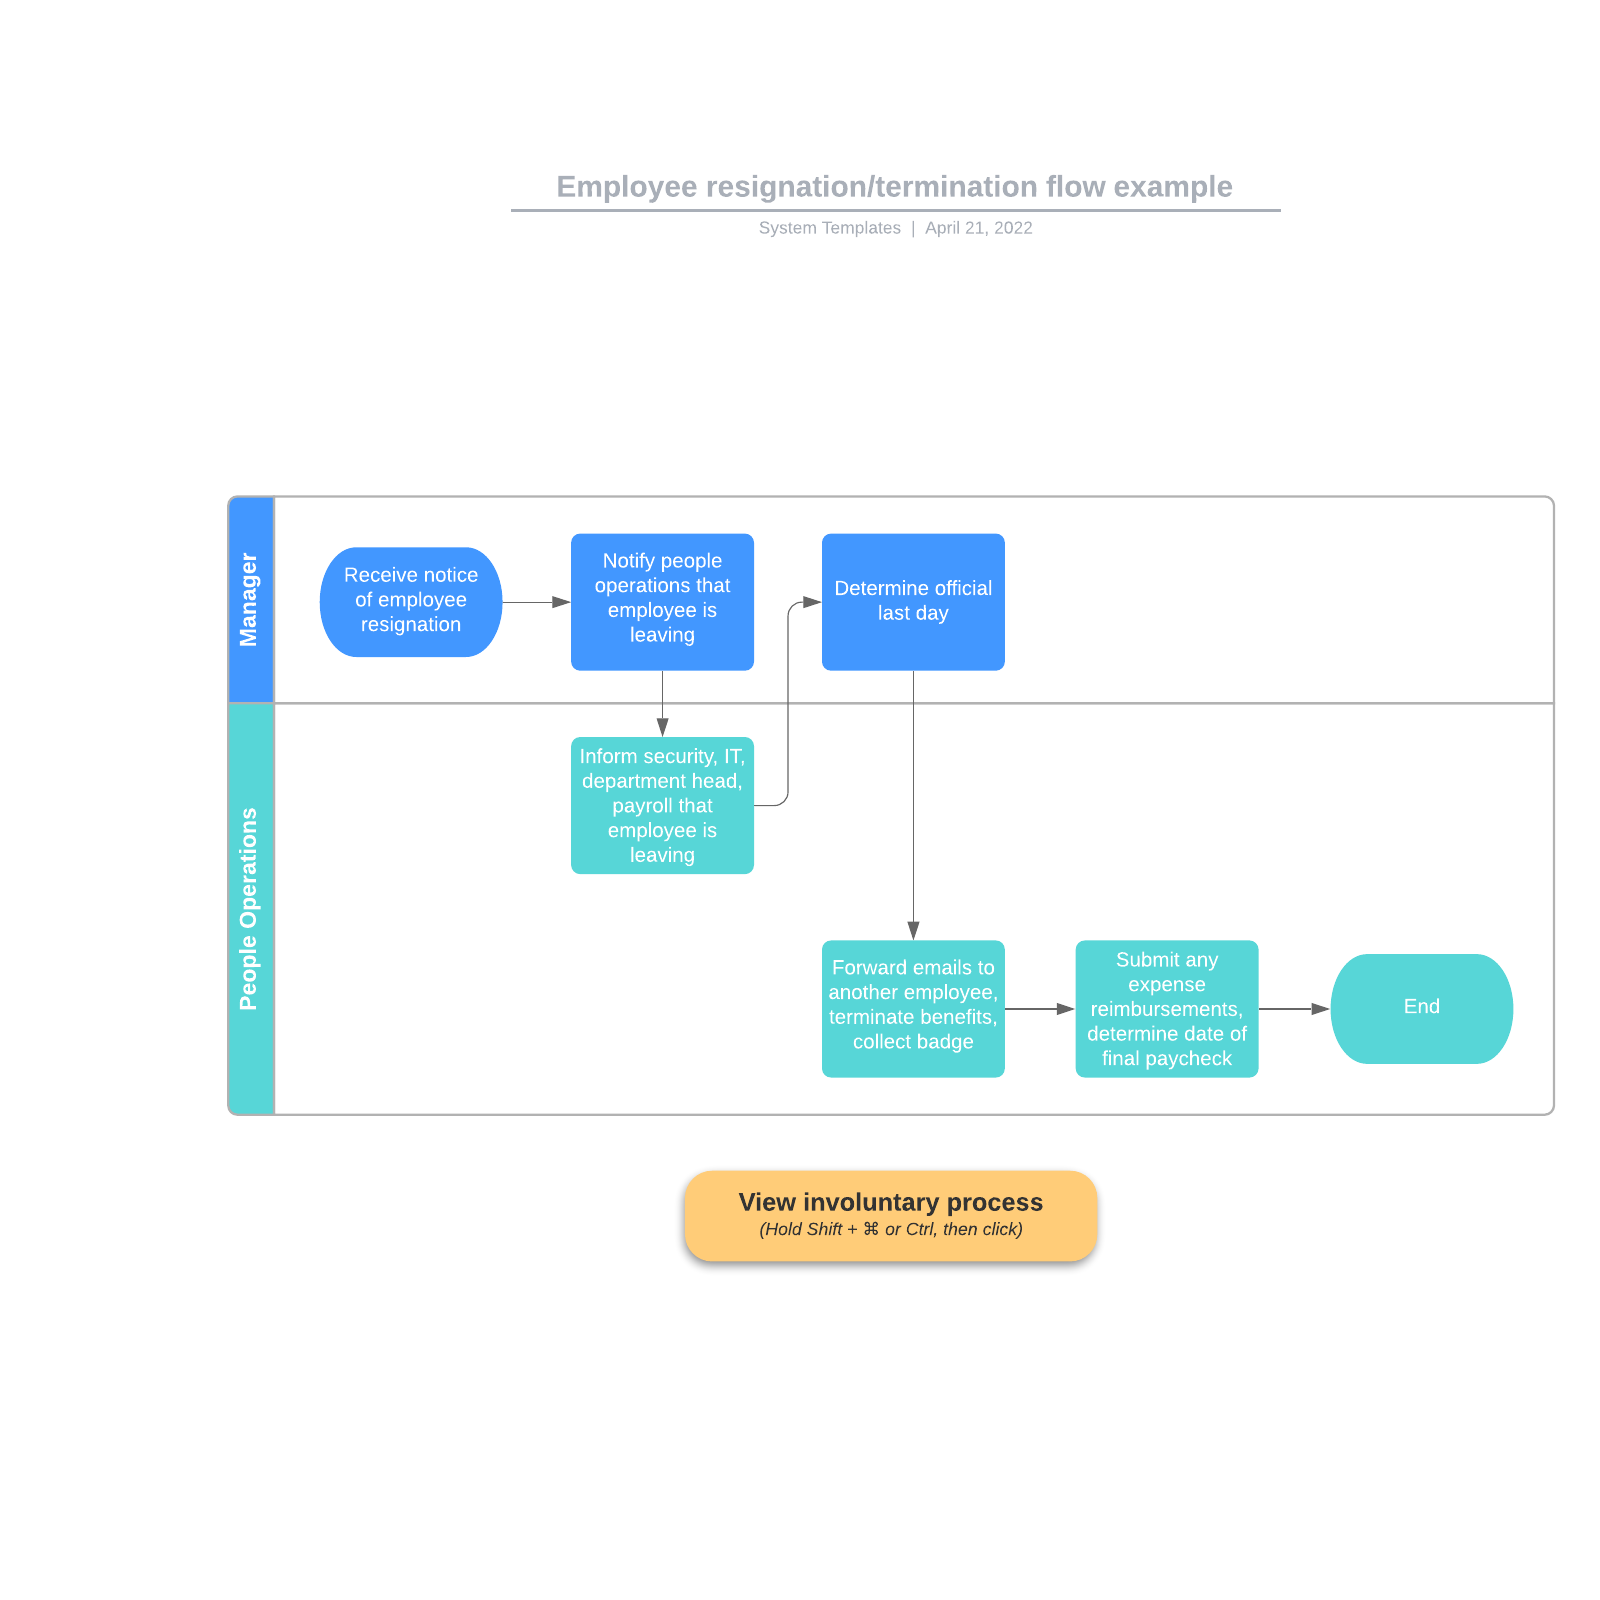 Employee resignation/termination flow example